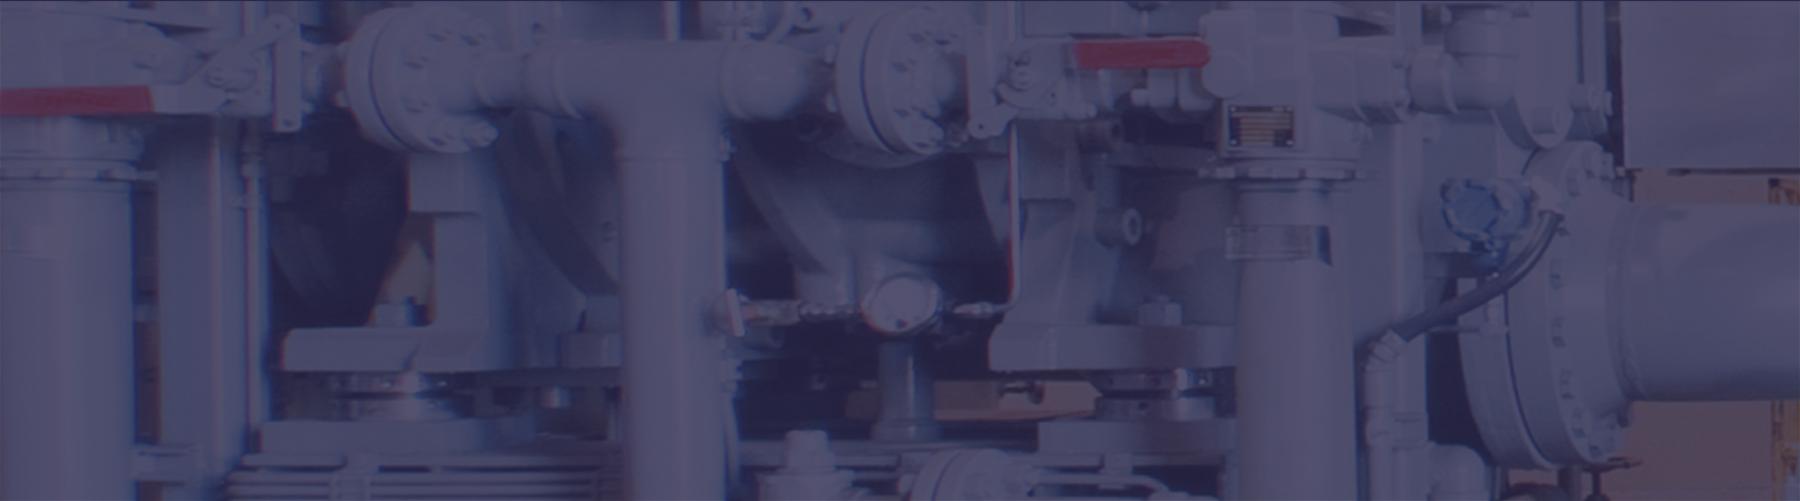 Compressor monitoring and control in remote areas